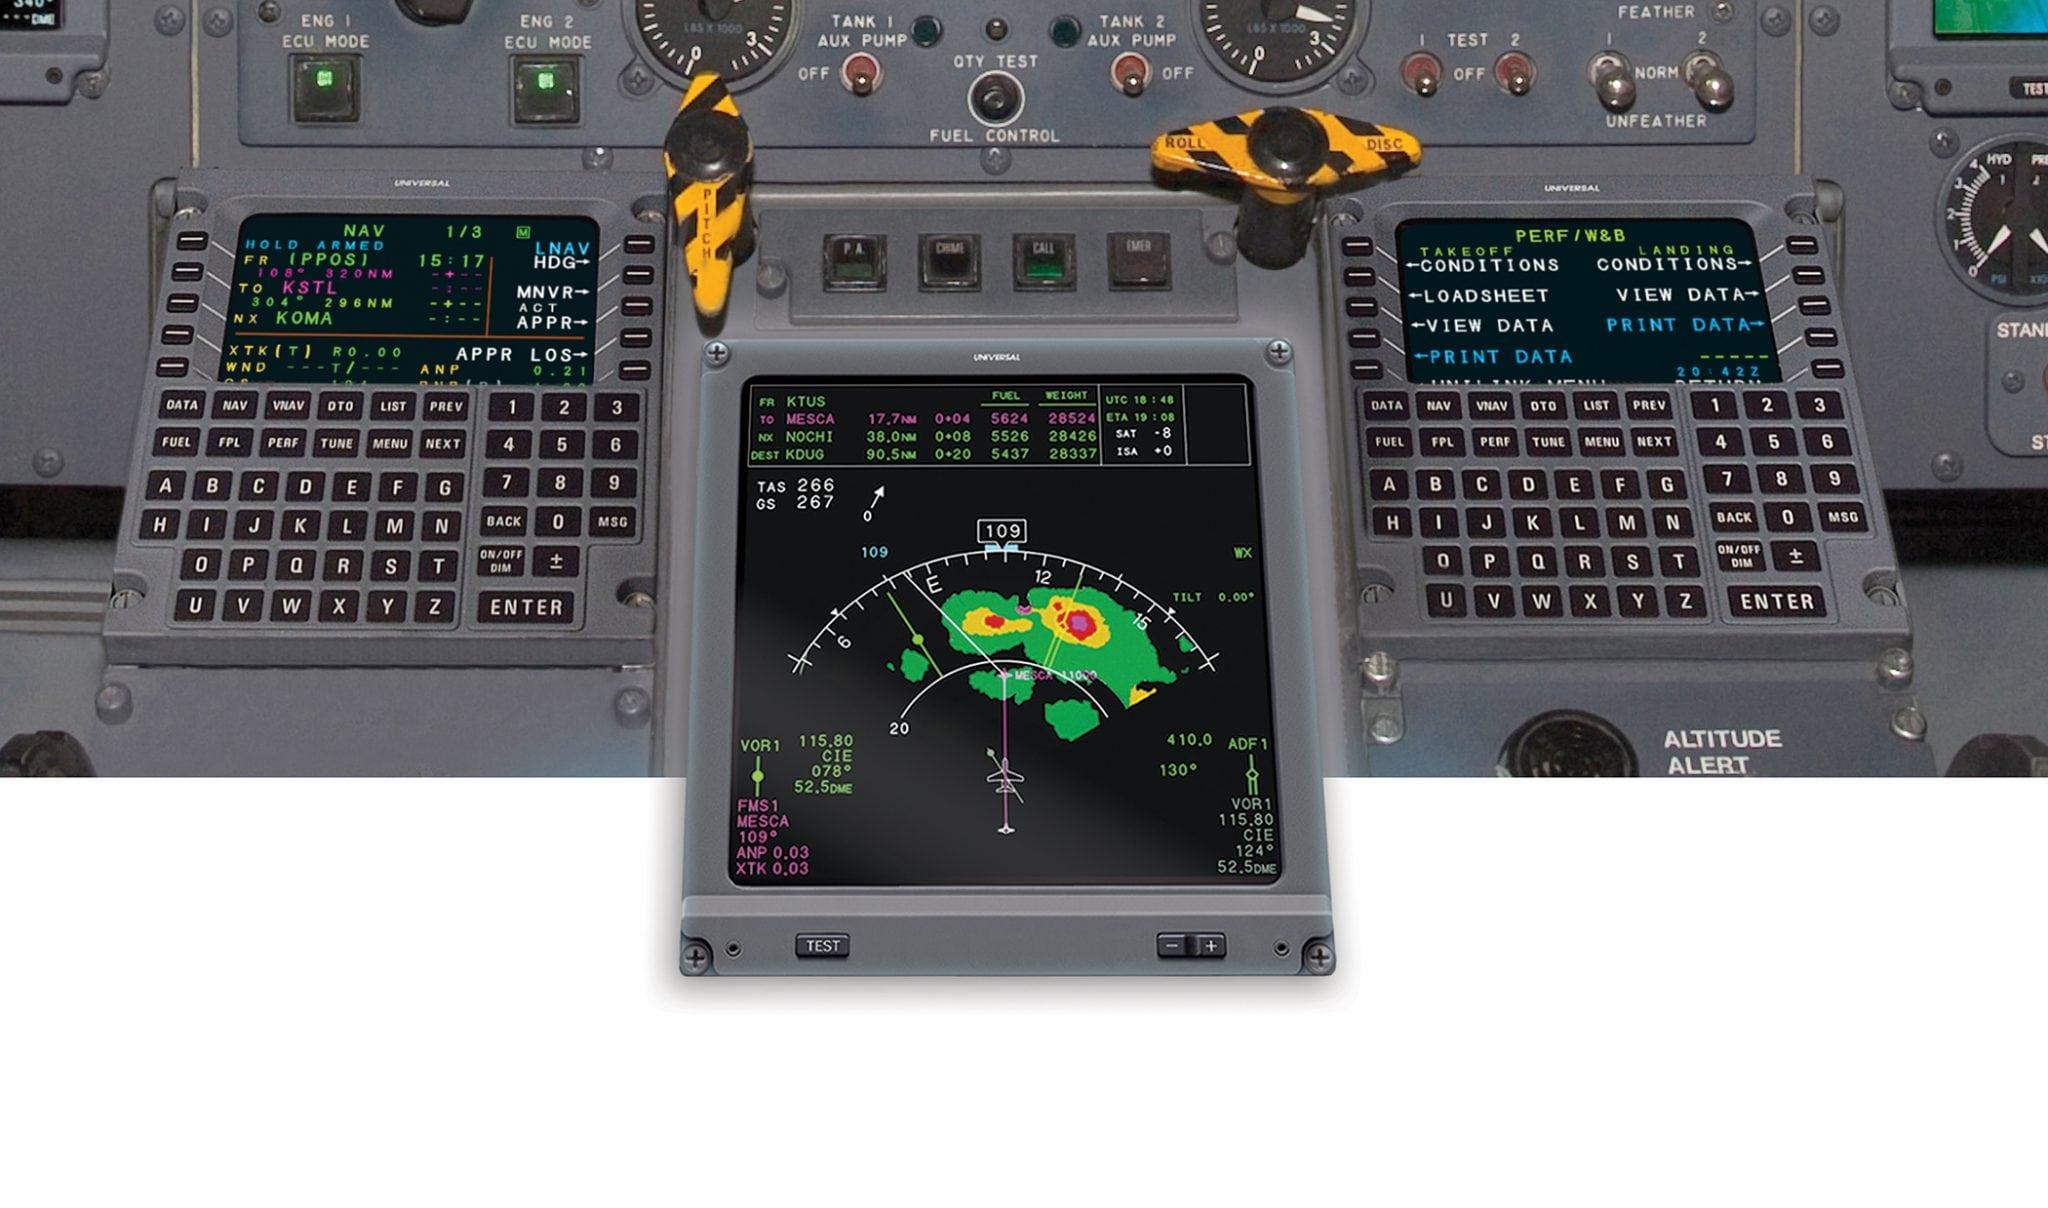 Universal Avionics' MFD-890R Multi-Function Display (MFD) system